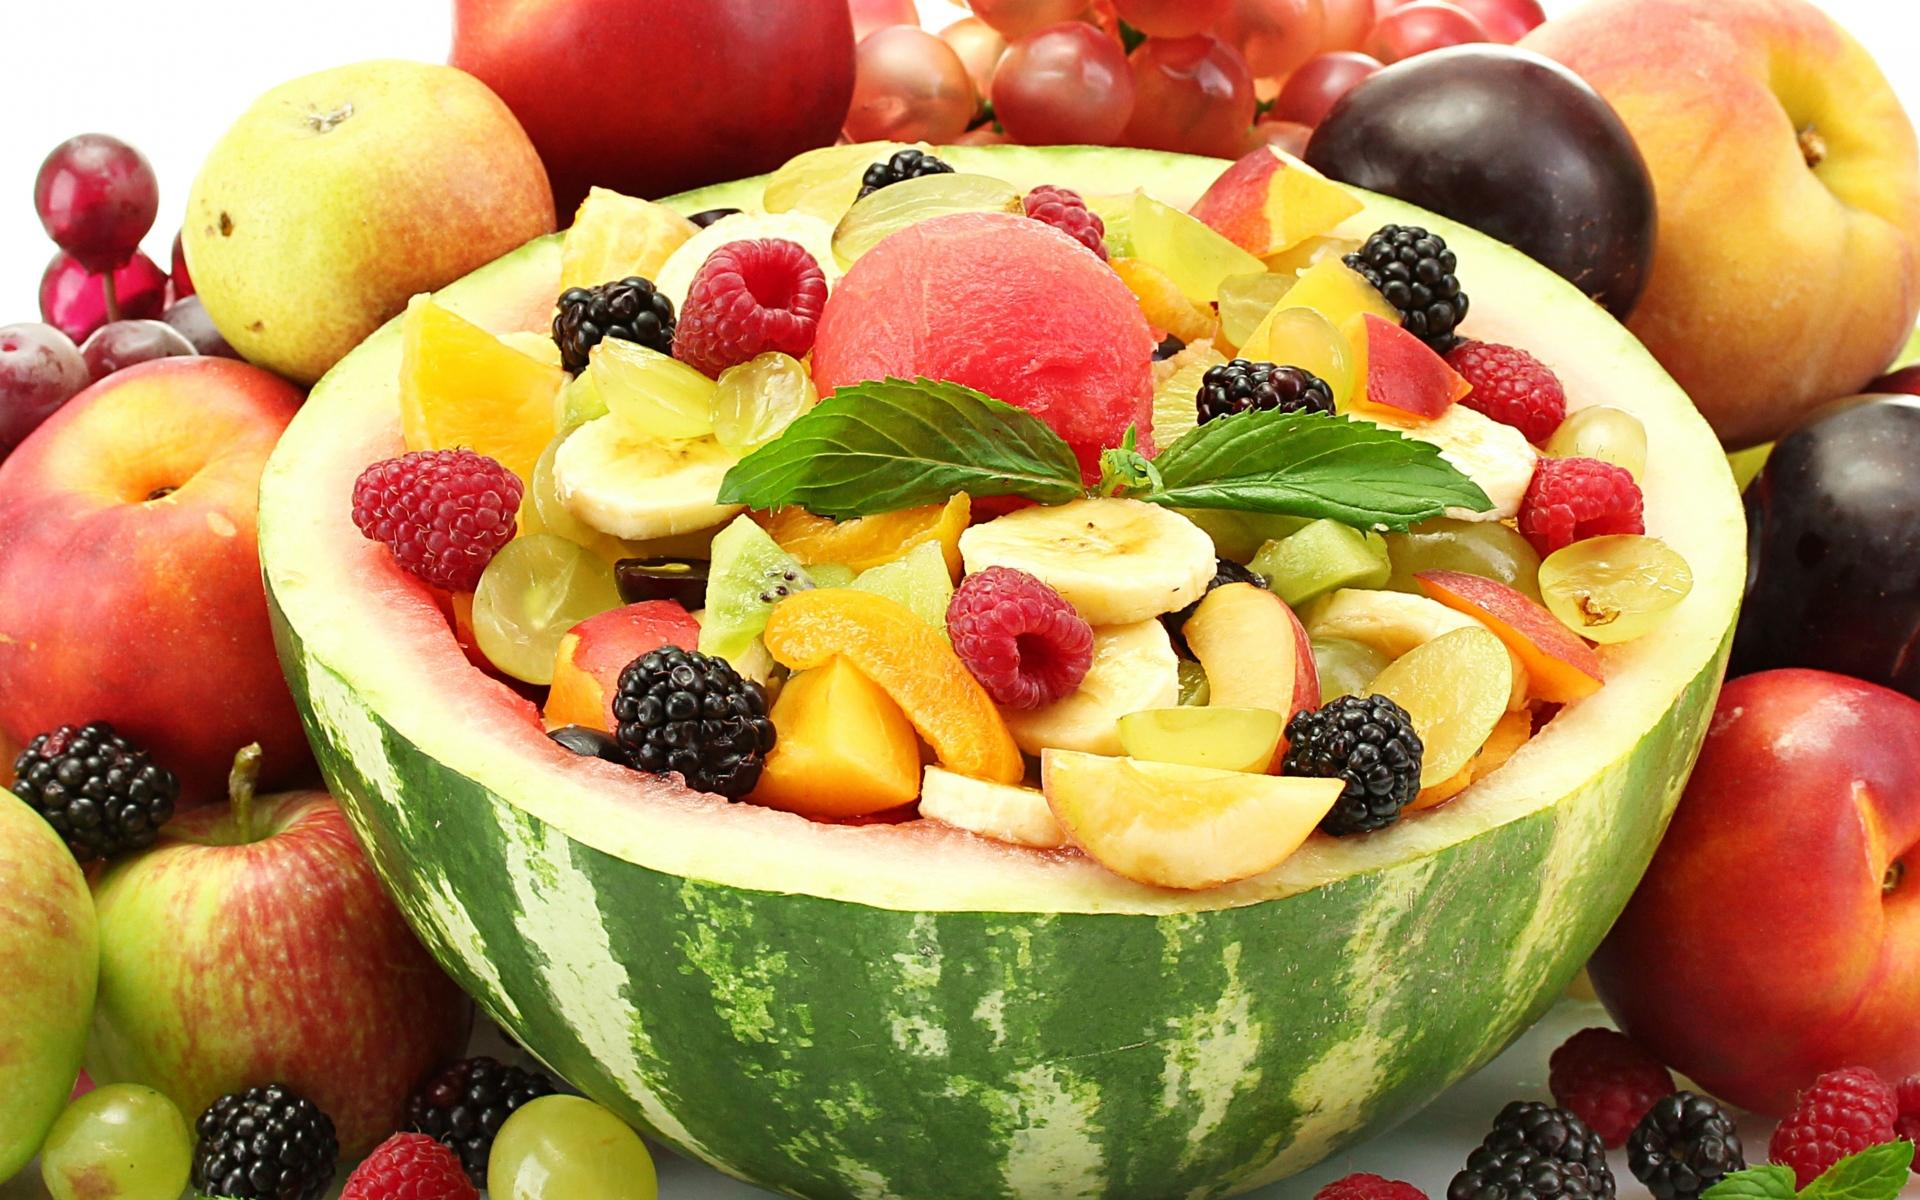 проглотил питон, красивые фото фруктов и ягод гранта прочно заняла